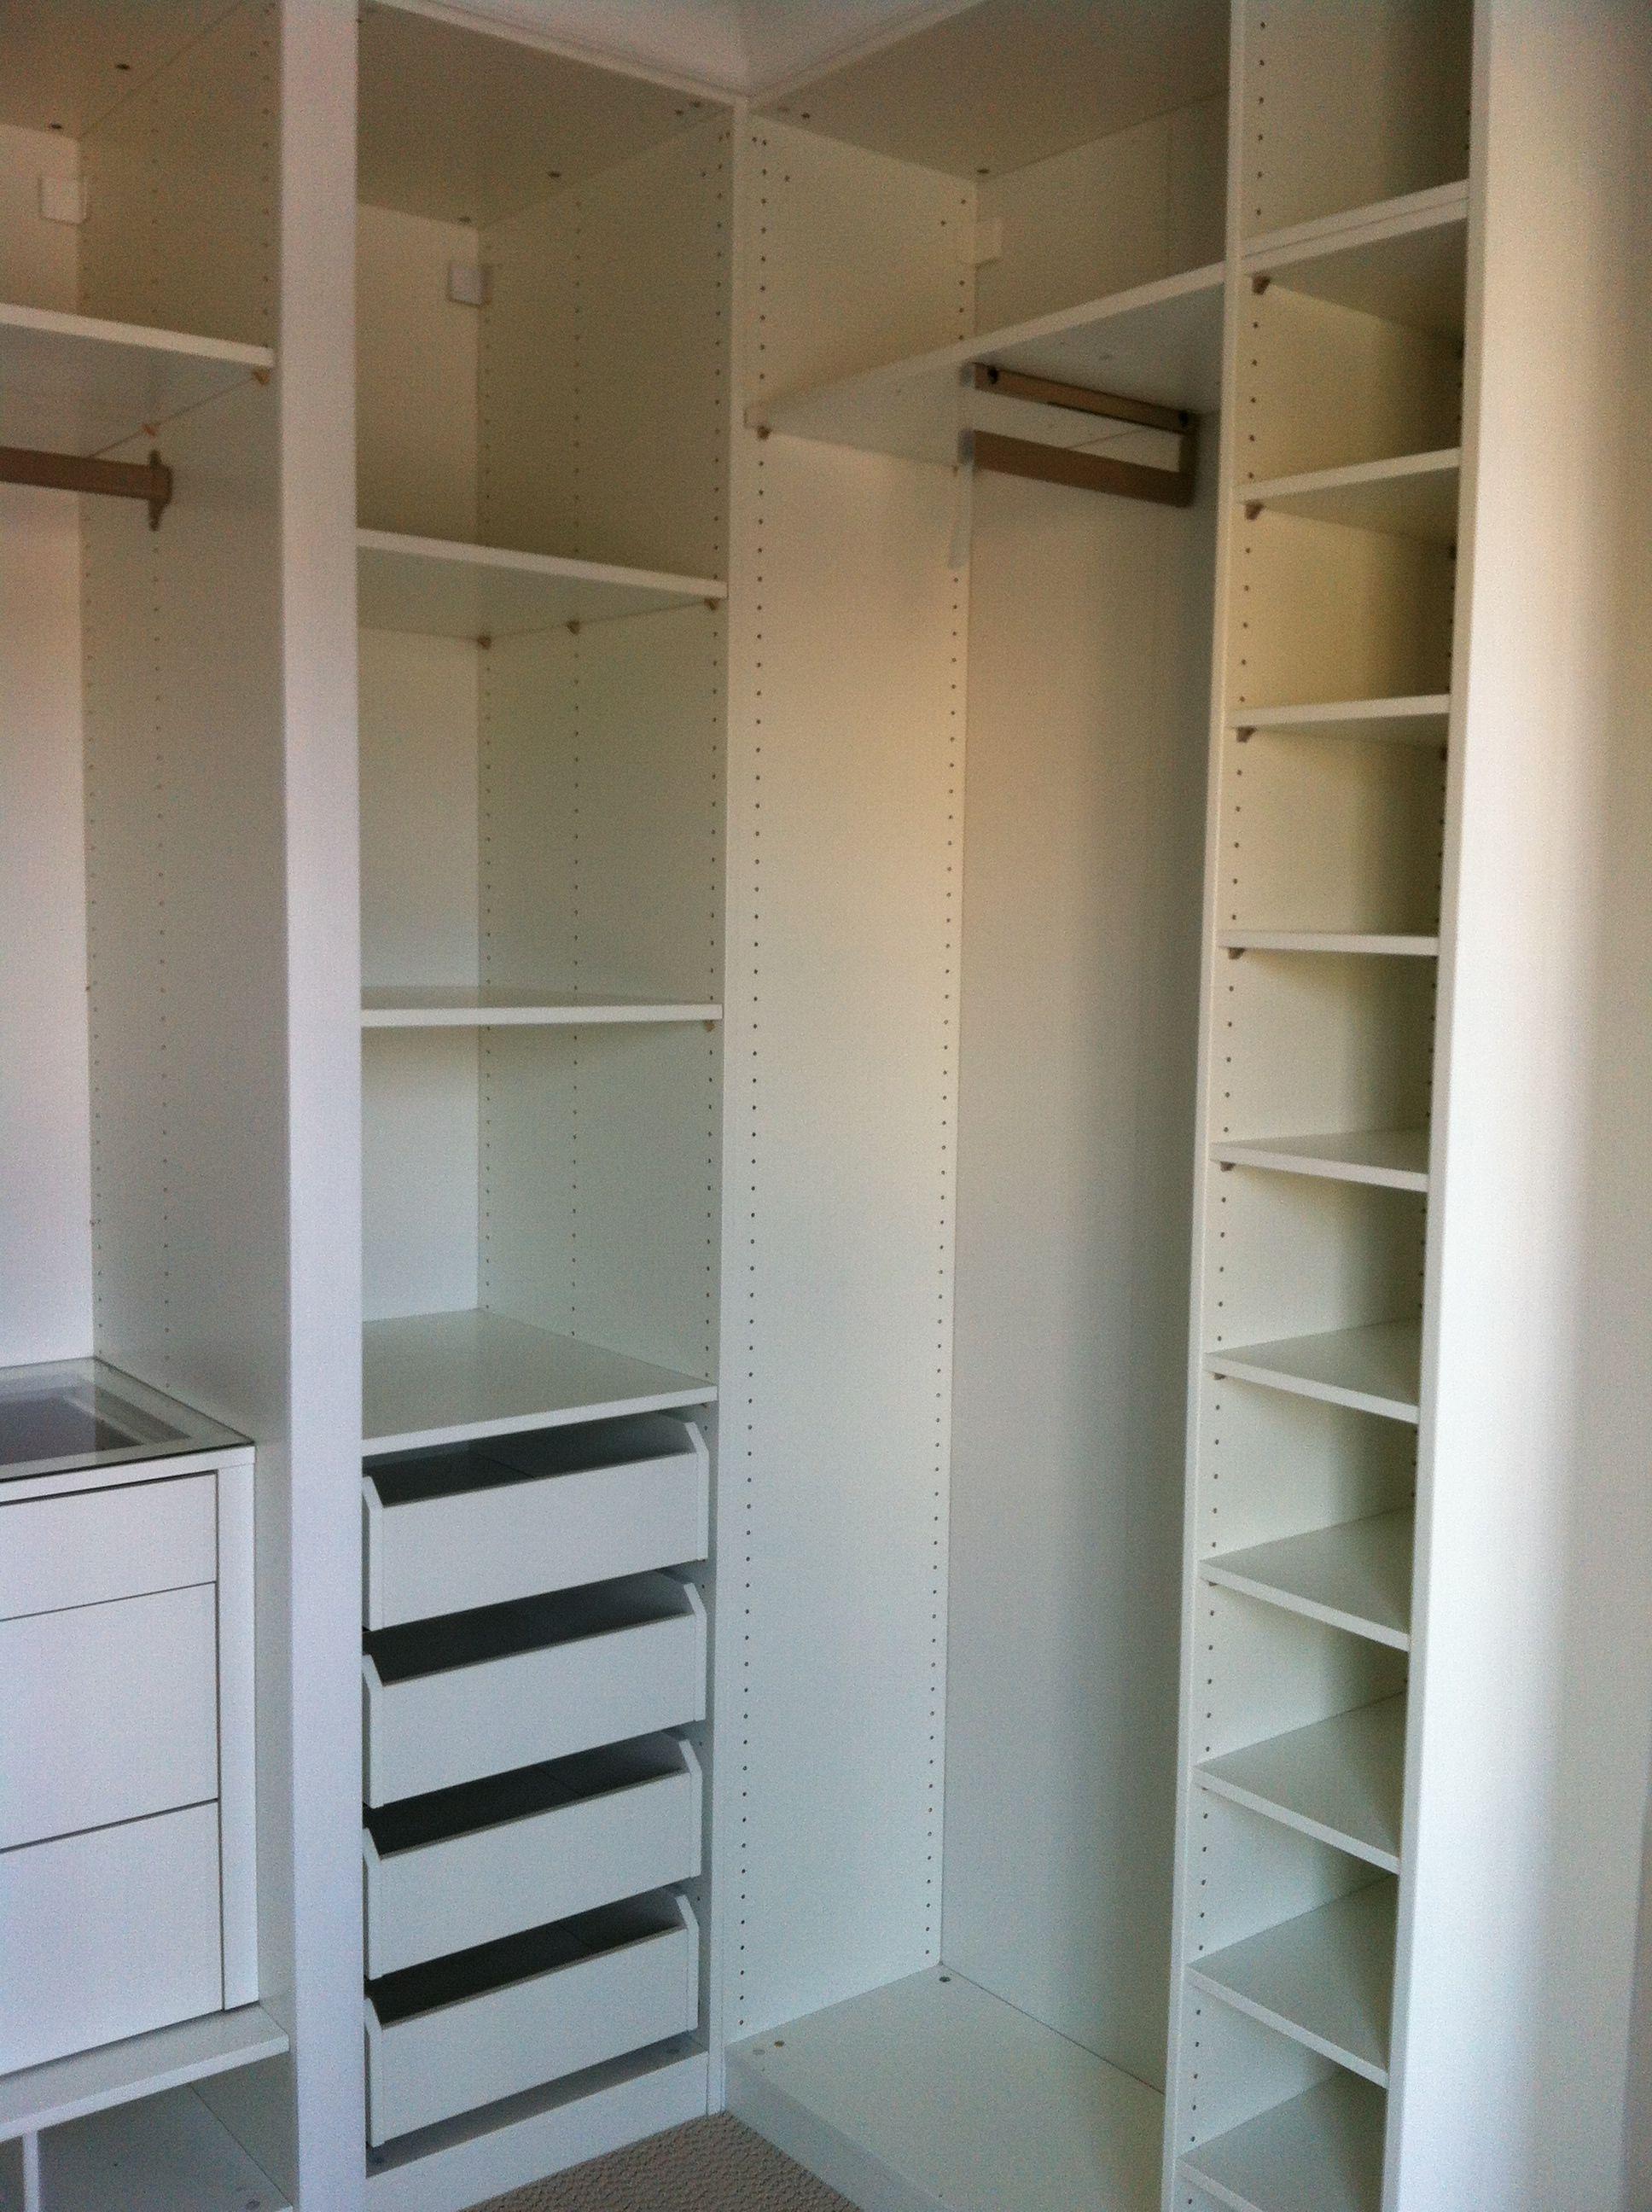 Remodel Small Closet Elegant Remodel Small Closet With